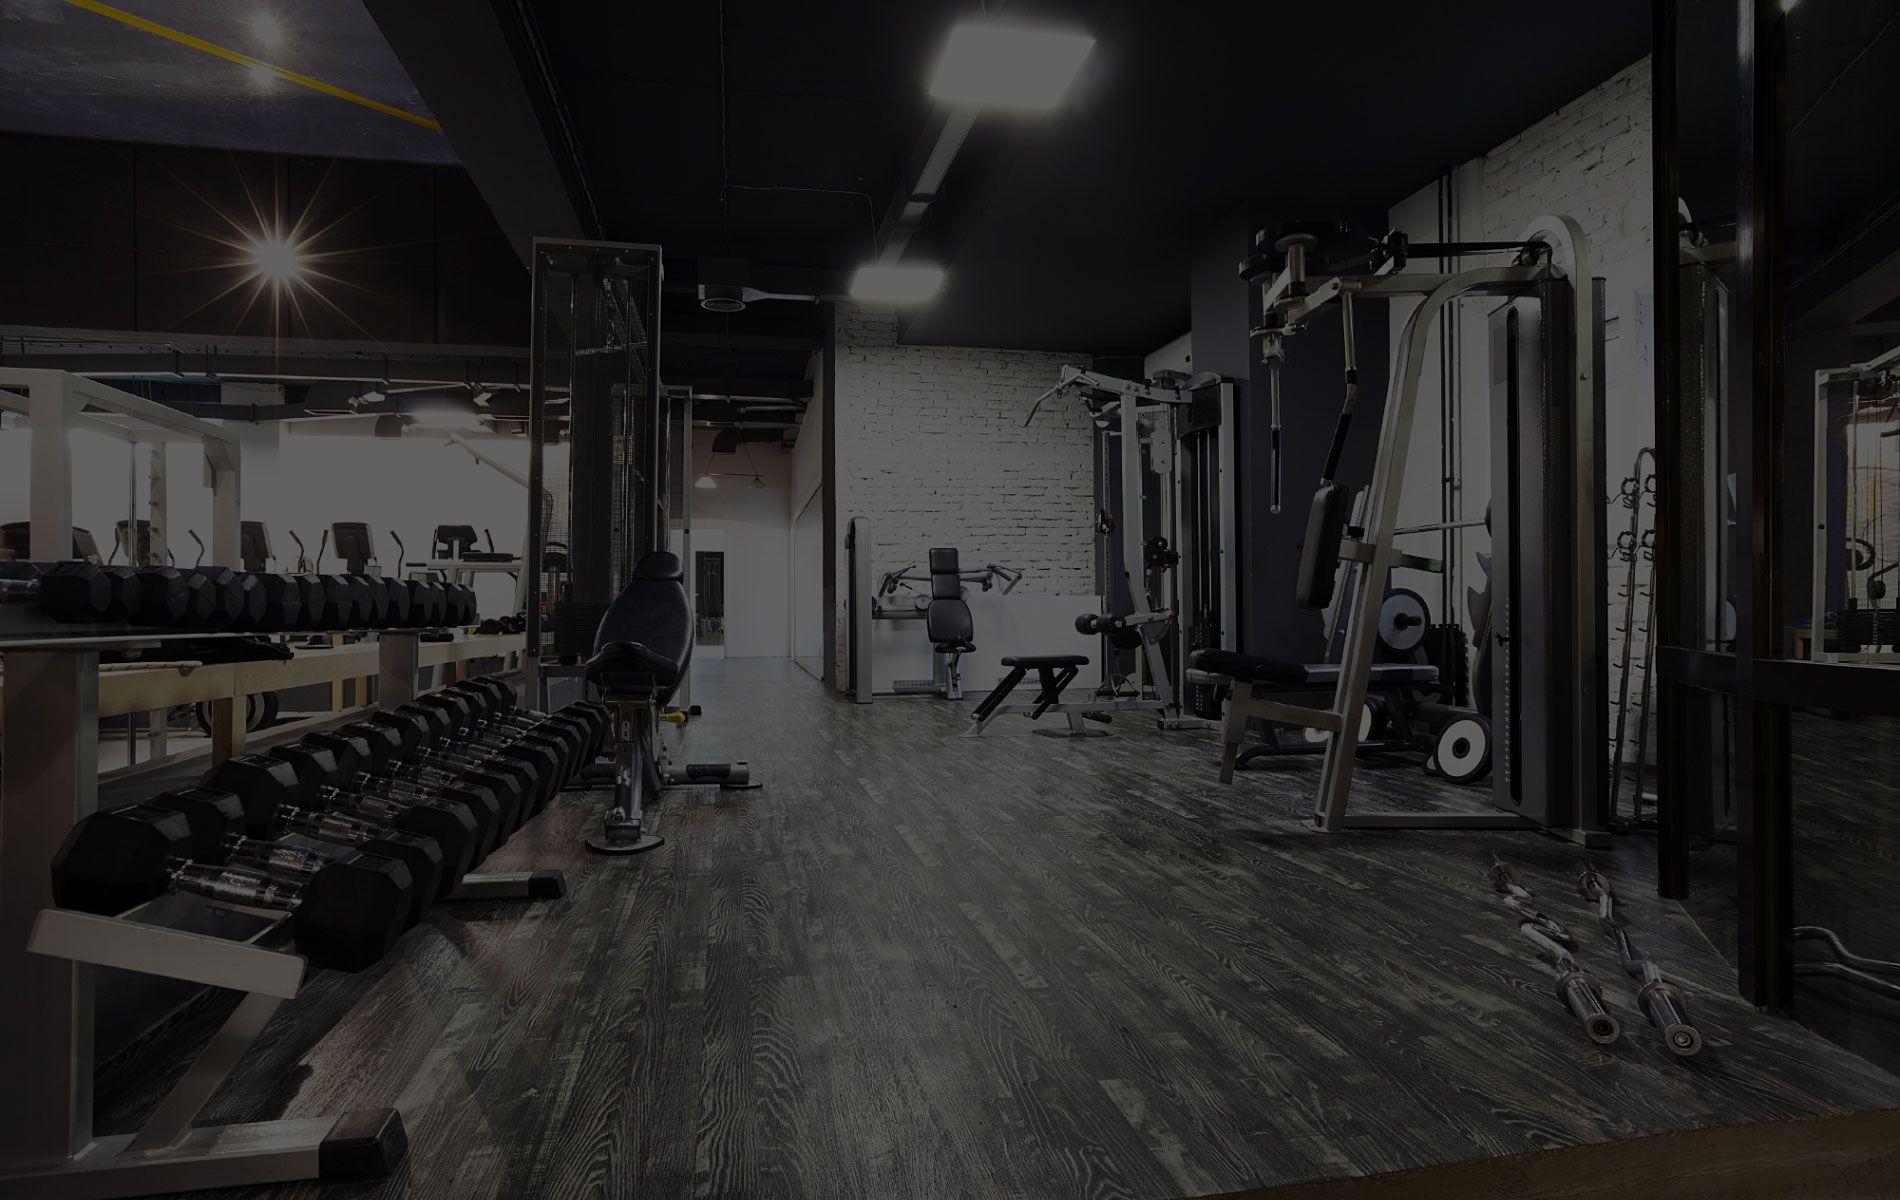 gym_bkgd-compressor-2